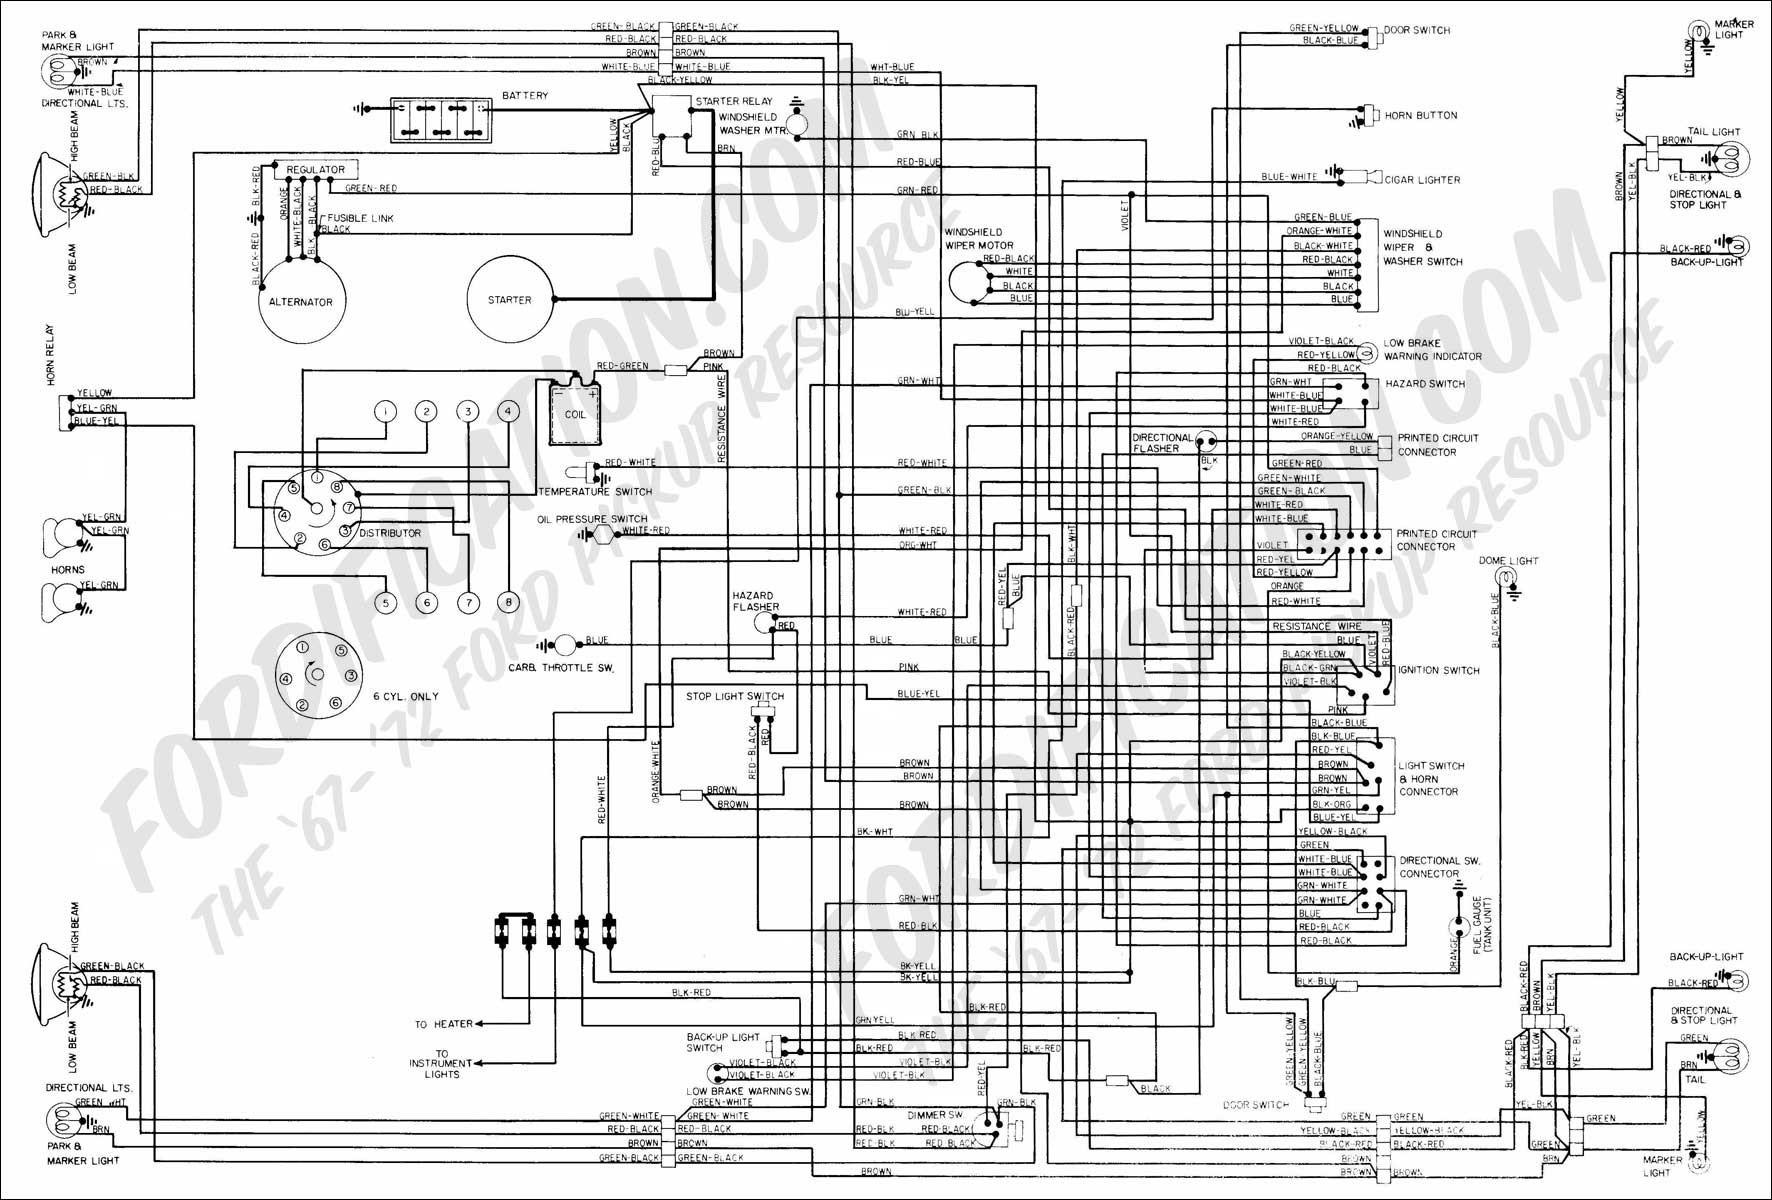 hight resolution of brake lights rear hazard not working ford truck pleasing 1996 f250 ford truck trailer wiring diagram